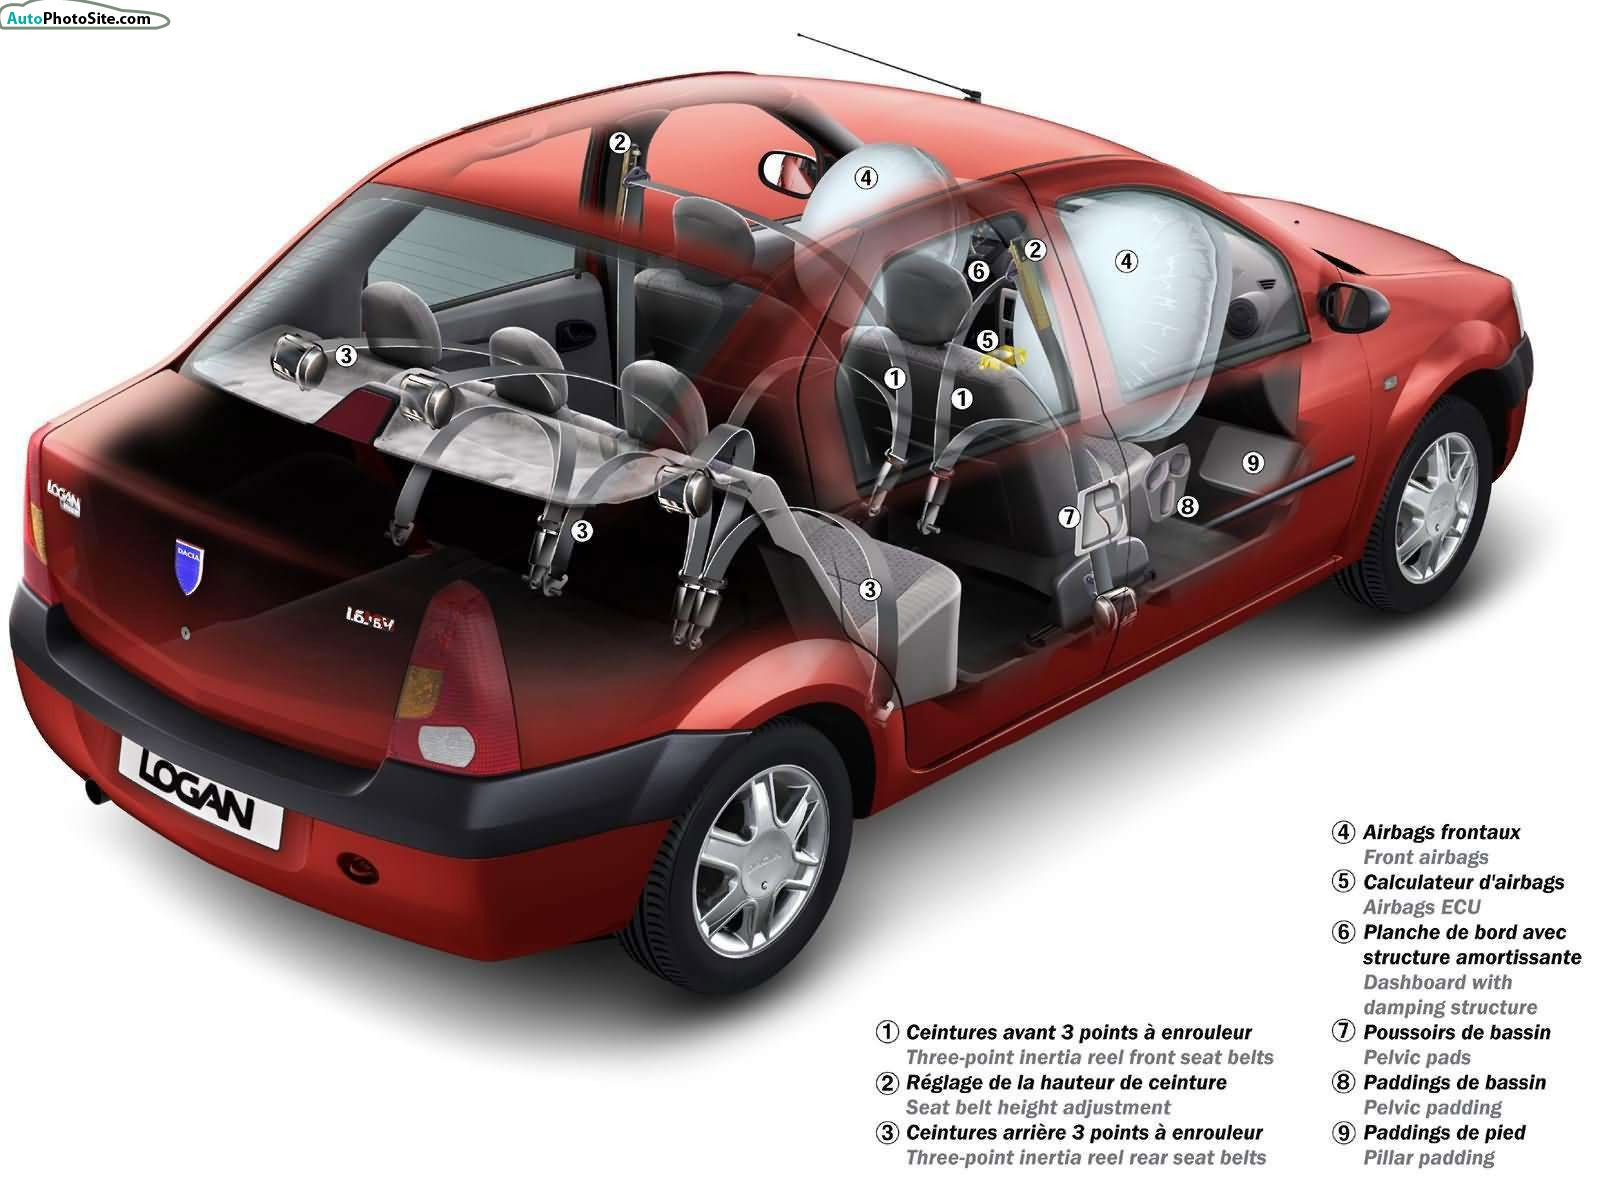 Dacia Logan 14 Mpi Cars 2016 Renault Interior Family Specs